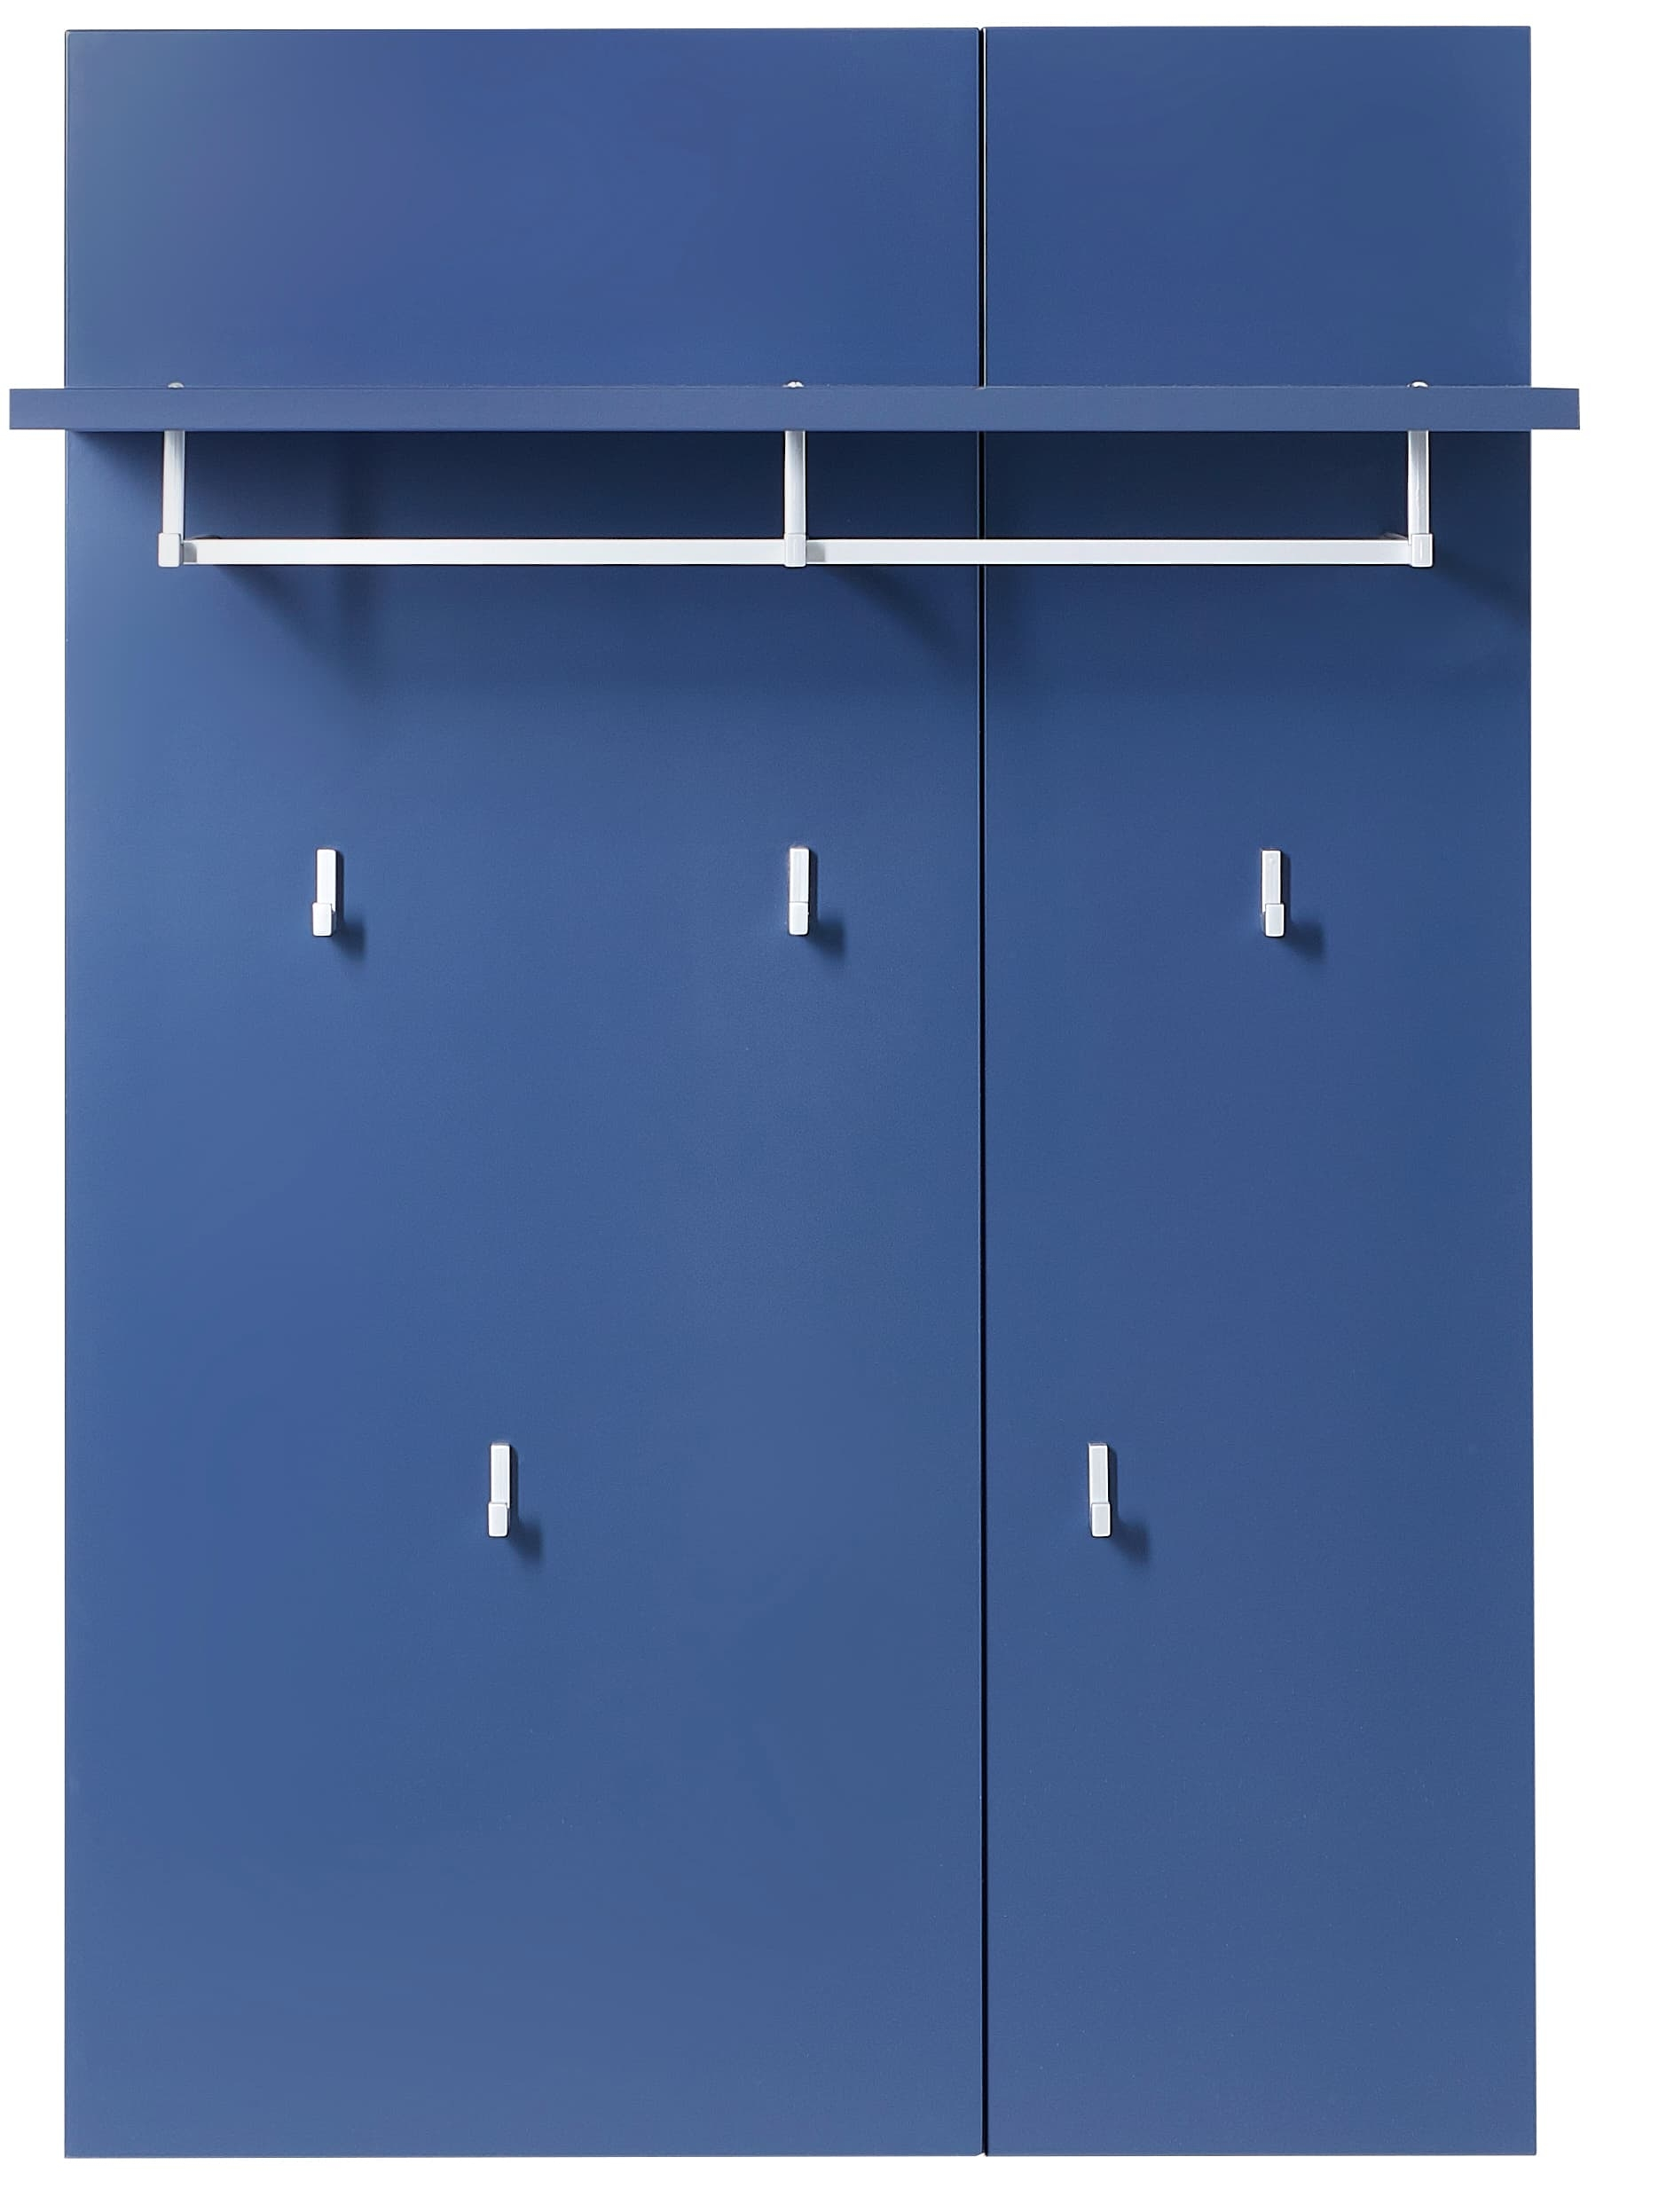 Cuier cu etajera din MDF Kalis Albastru, l80xA30xH116 cm somproduct.ro